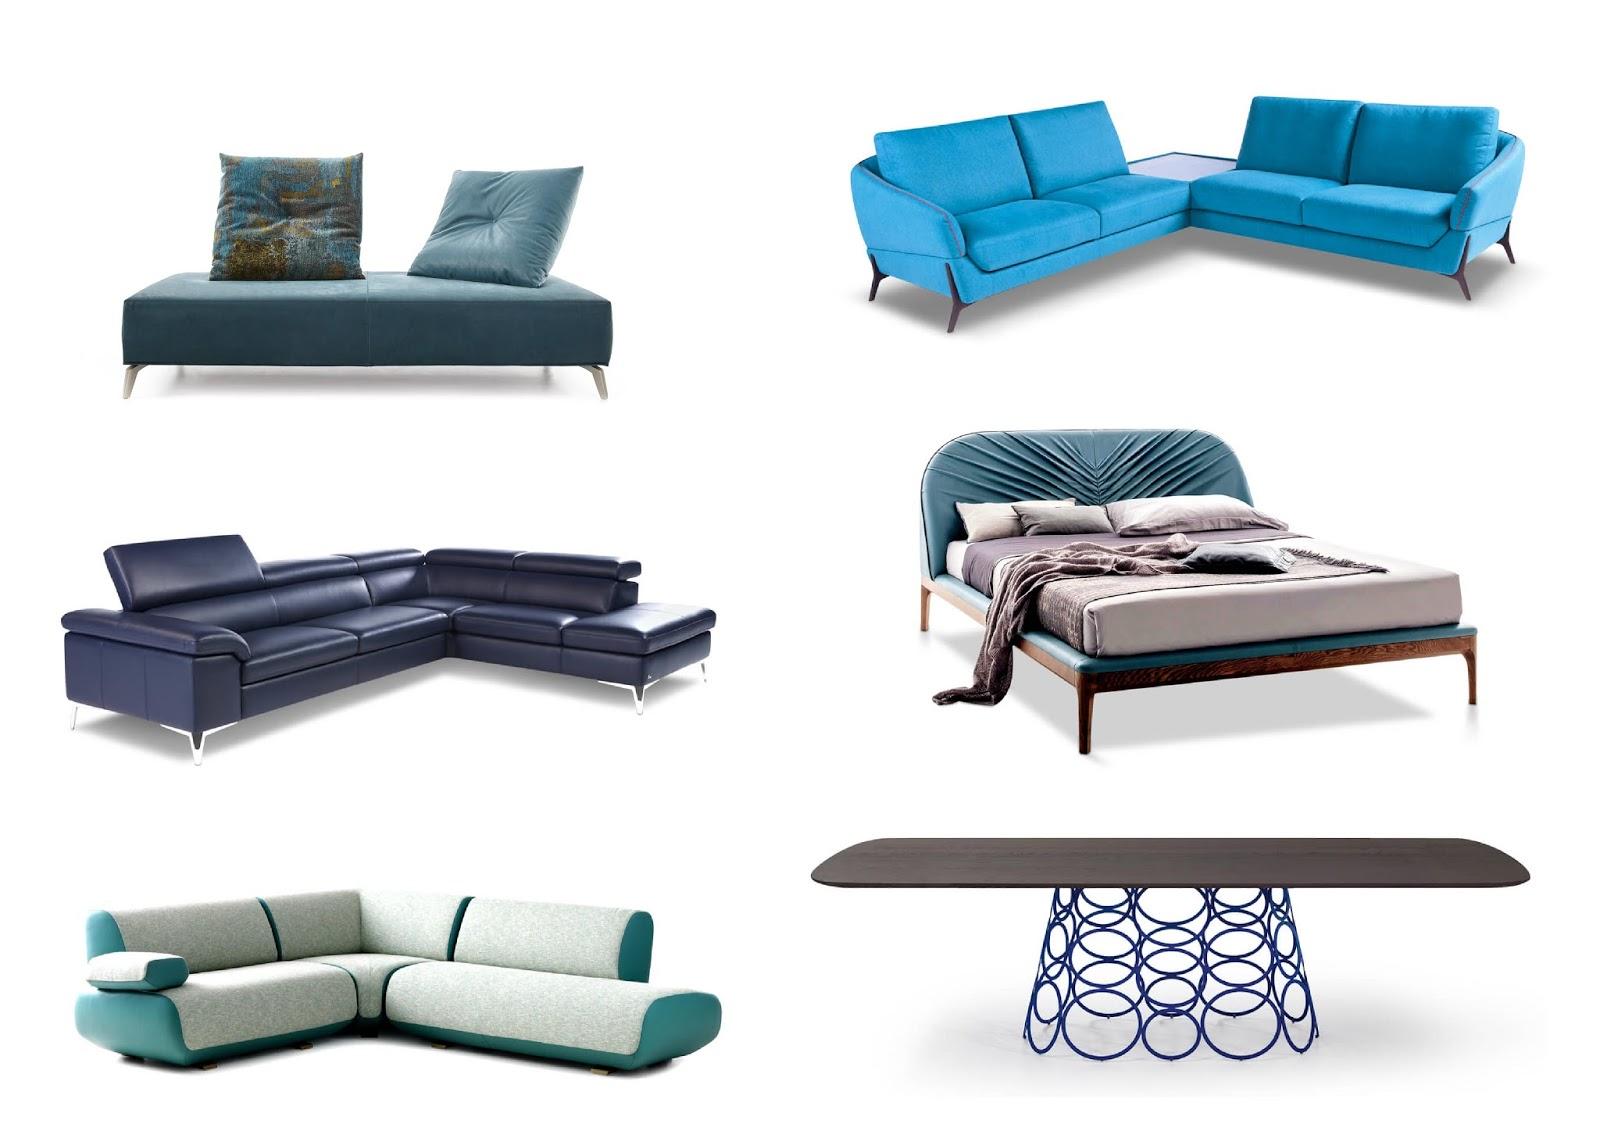 2016 ~ Simply Sofas - So Fa So Good